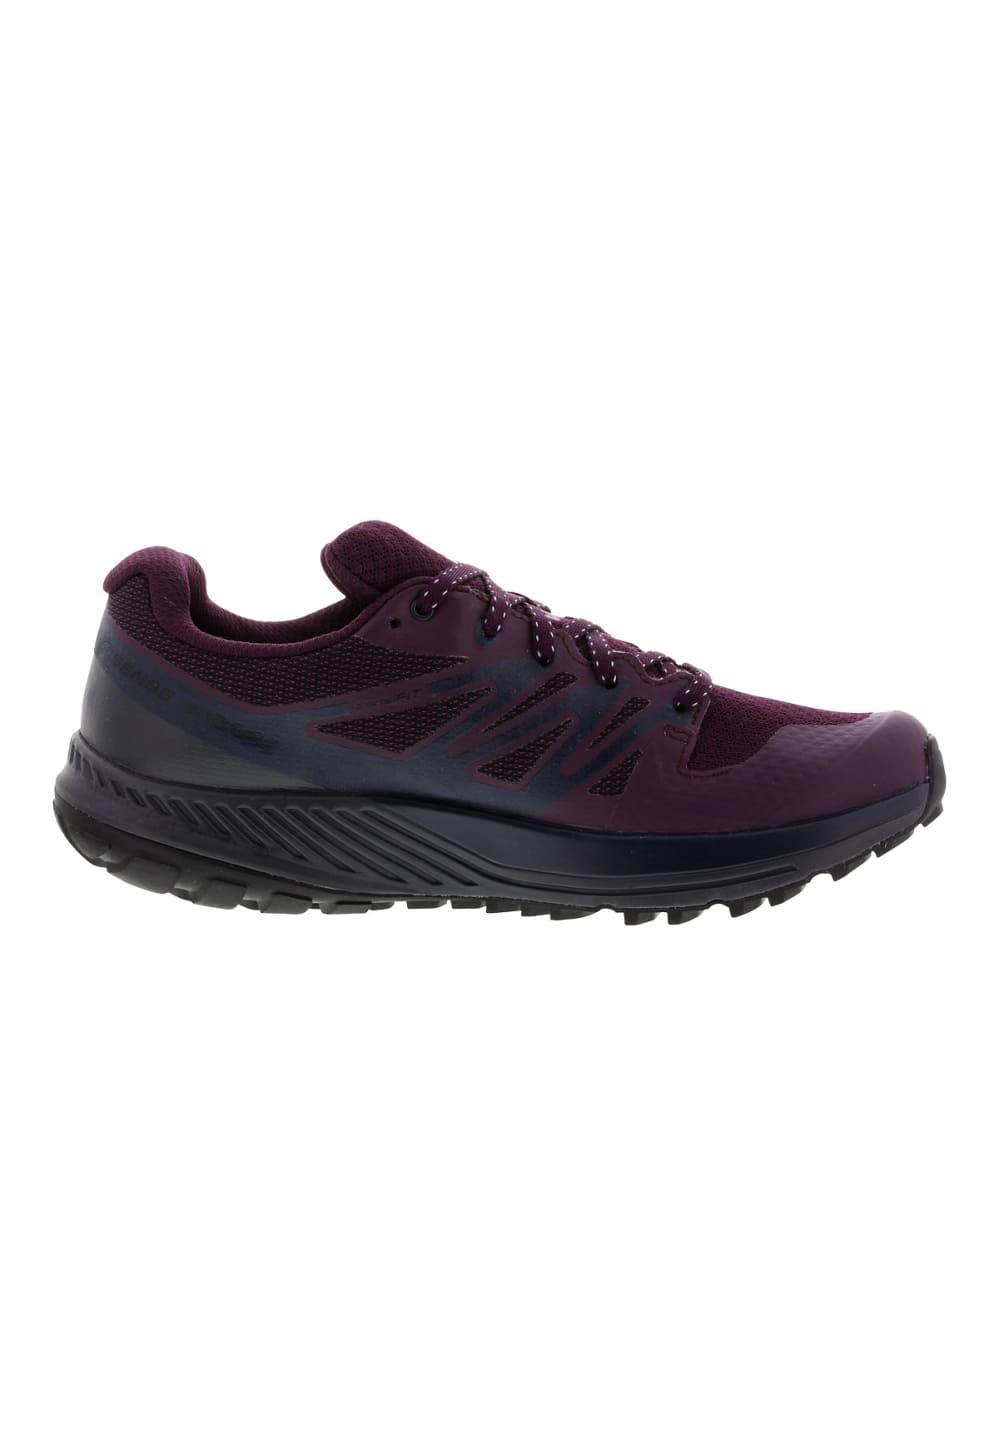 Rouge Chaussures 21run Gtx Escape Sense Femme Pour Running Salomon 4Ut0n